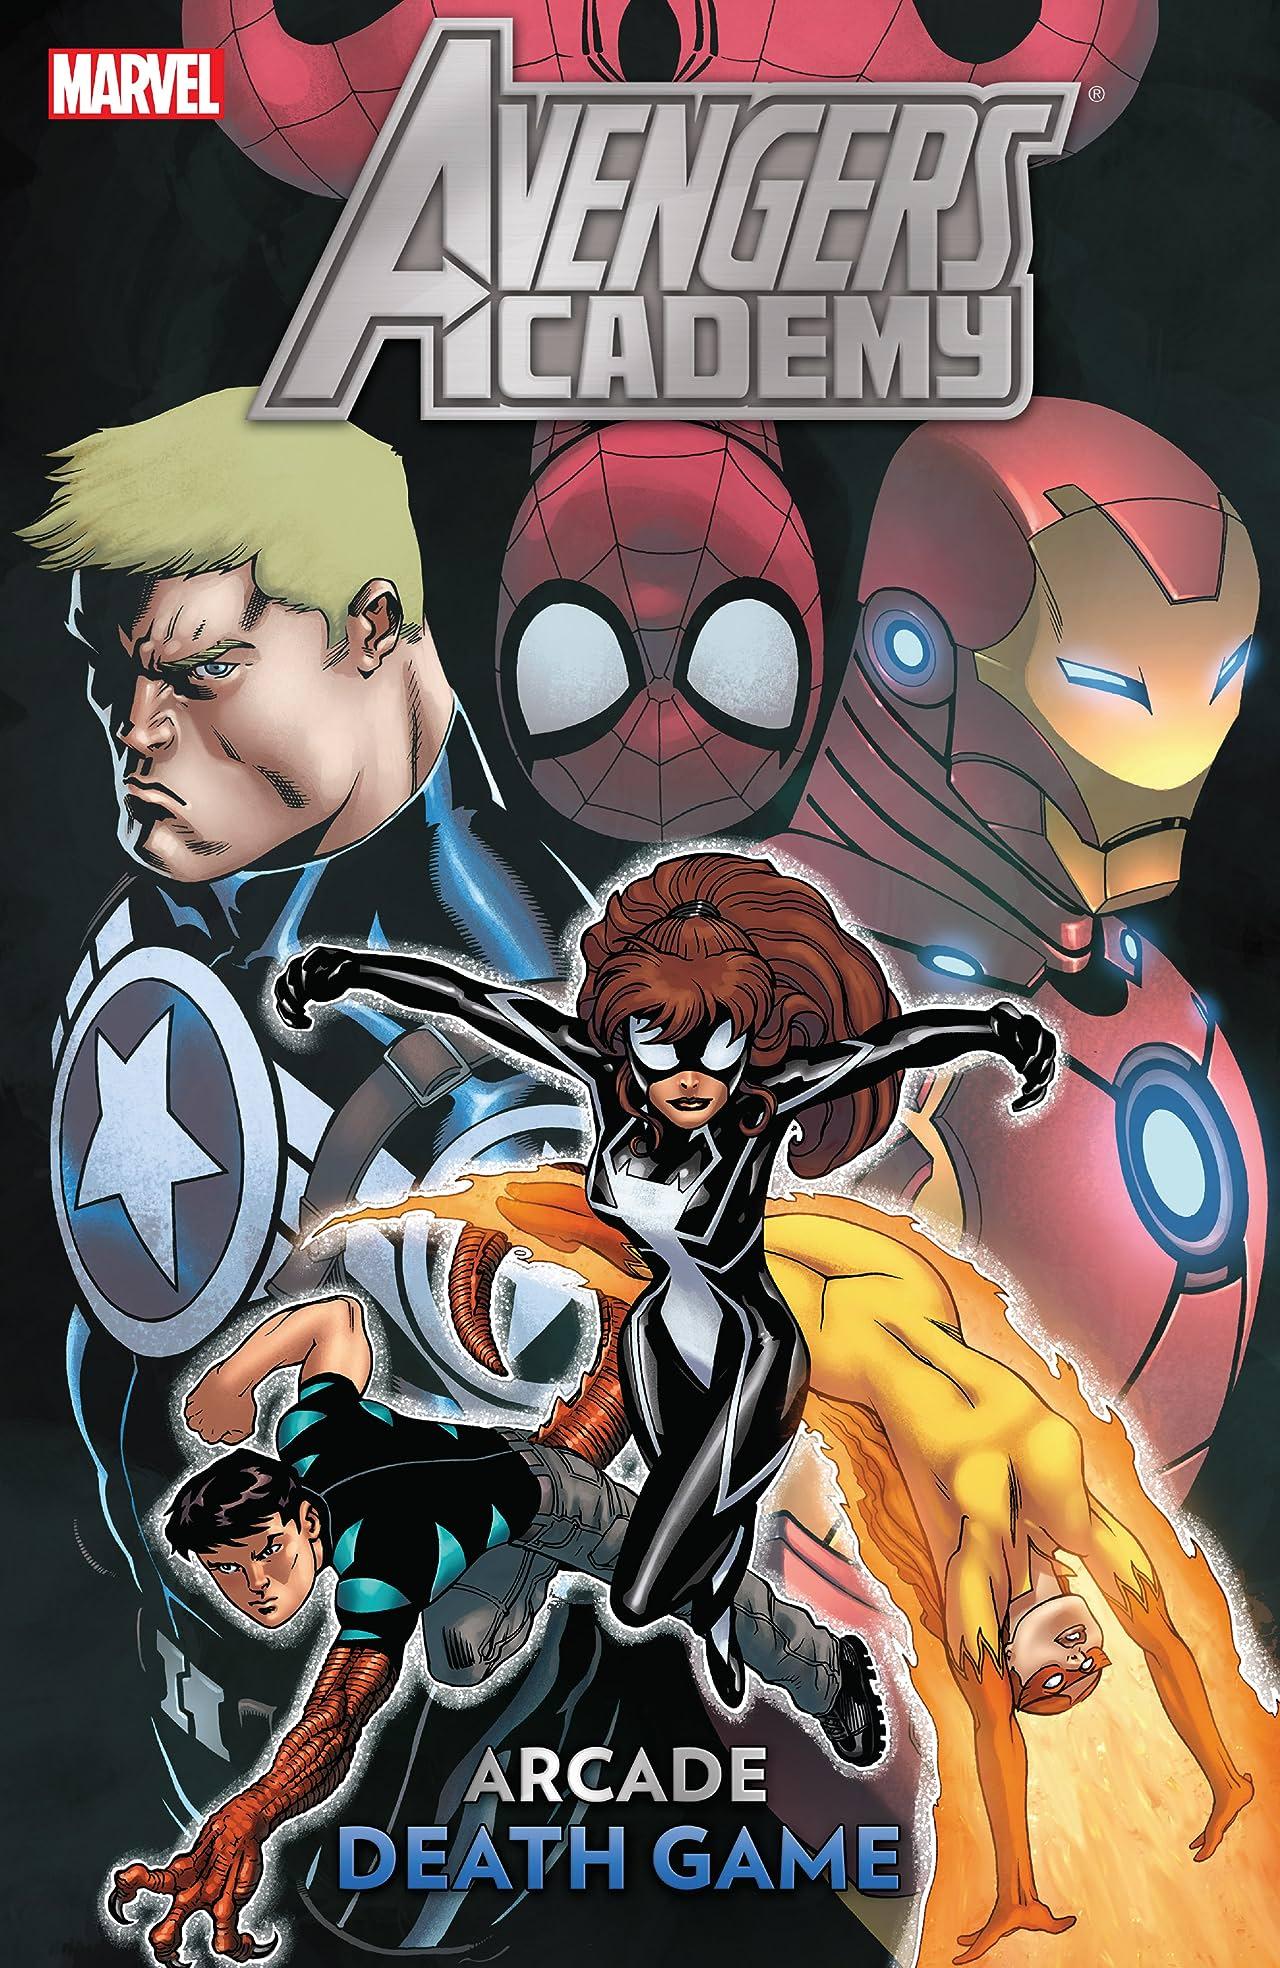 Avengers Academy: Arcade - Death Game